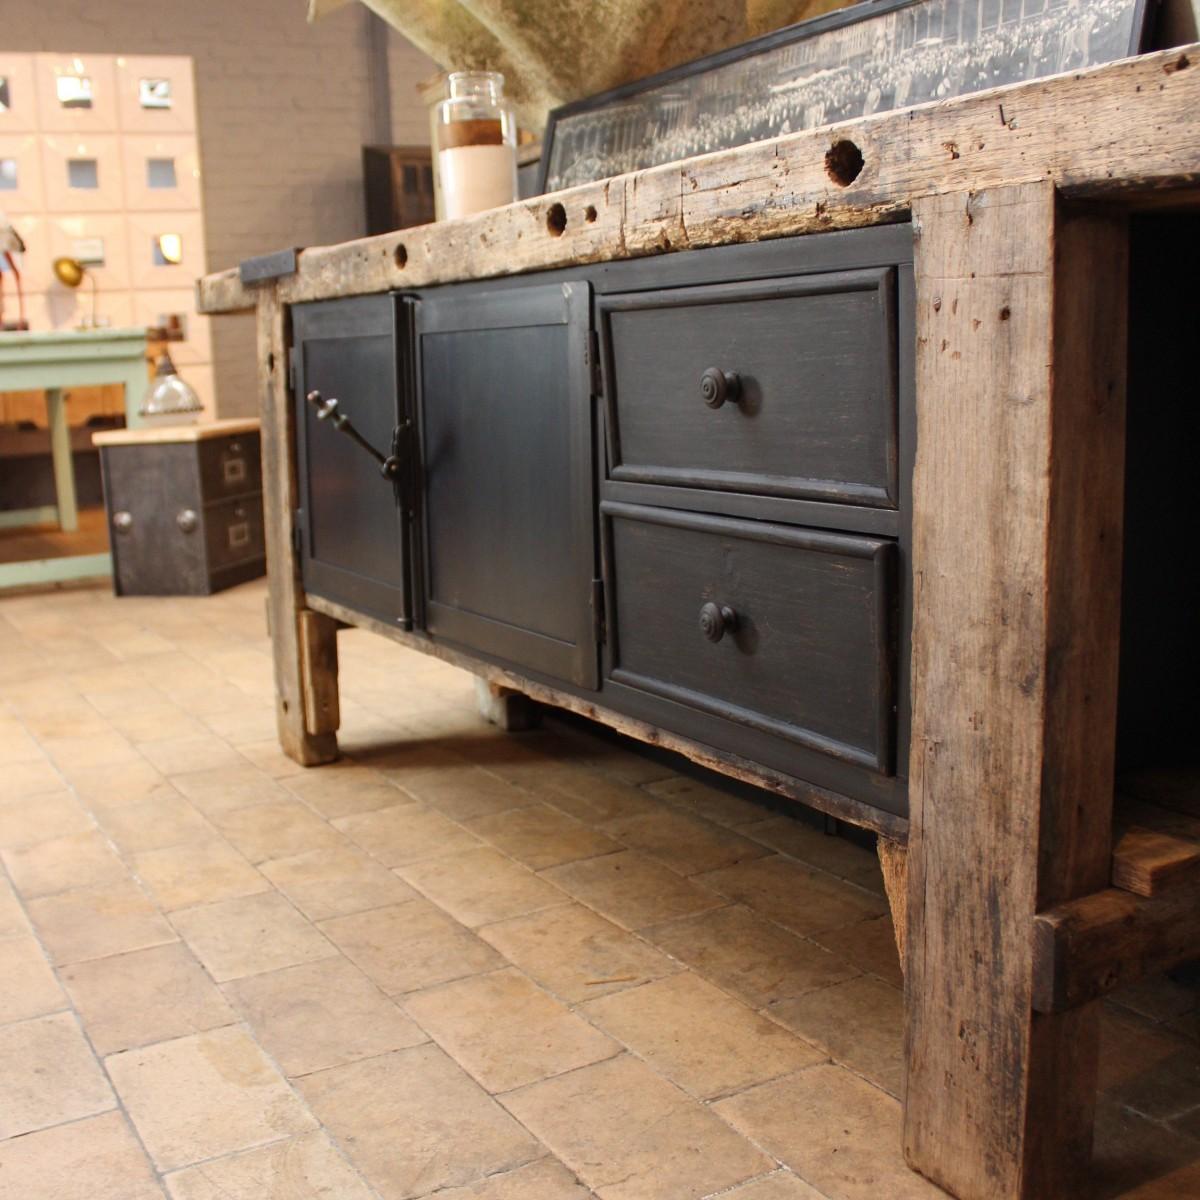 ancien tabli industriel. Black Bedroom Furniture Sets. Home Design Ideas